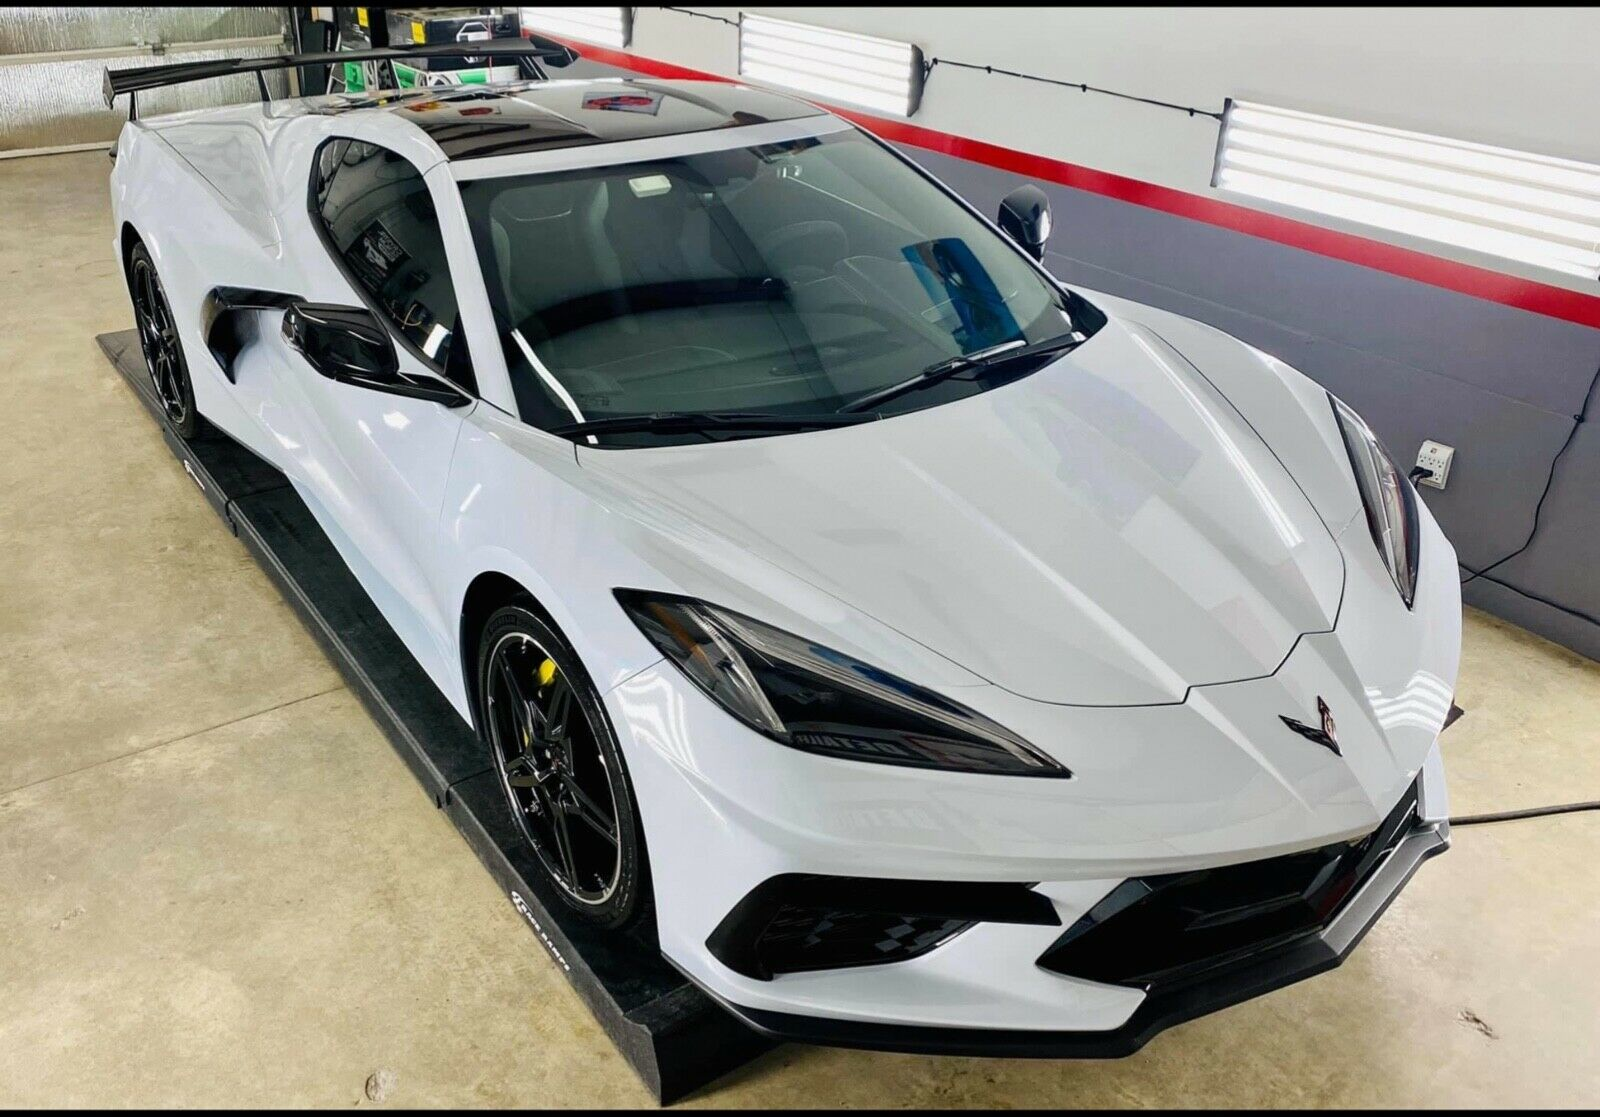 2020  Chevrolet Corvette   | C7 Corvette Photo 1